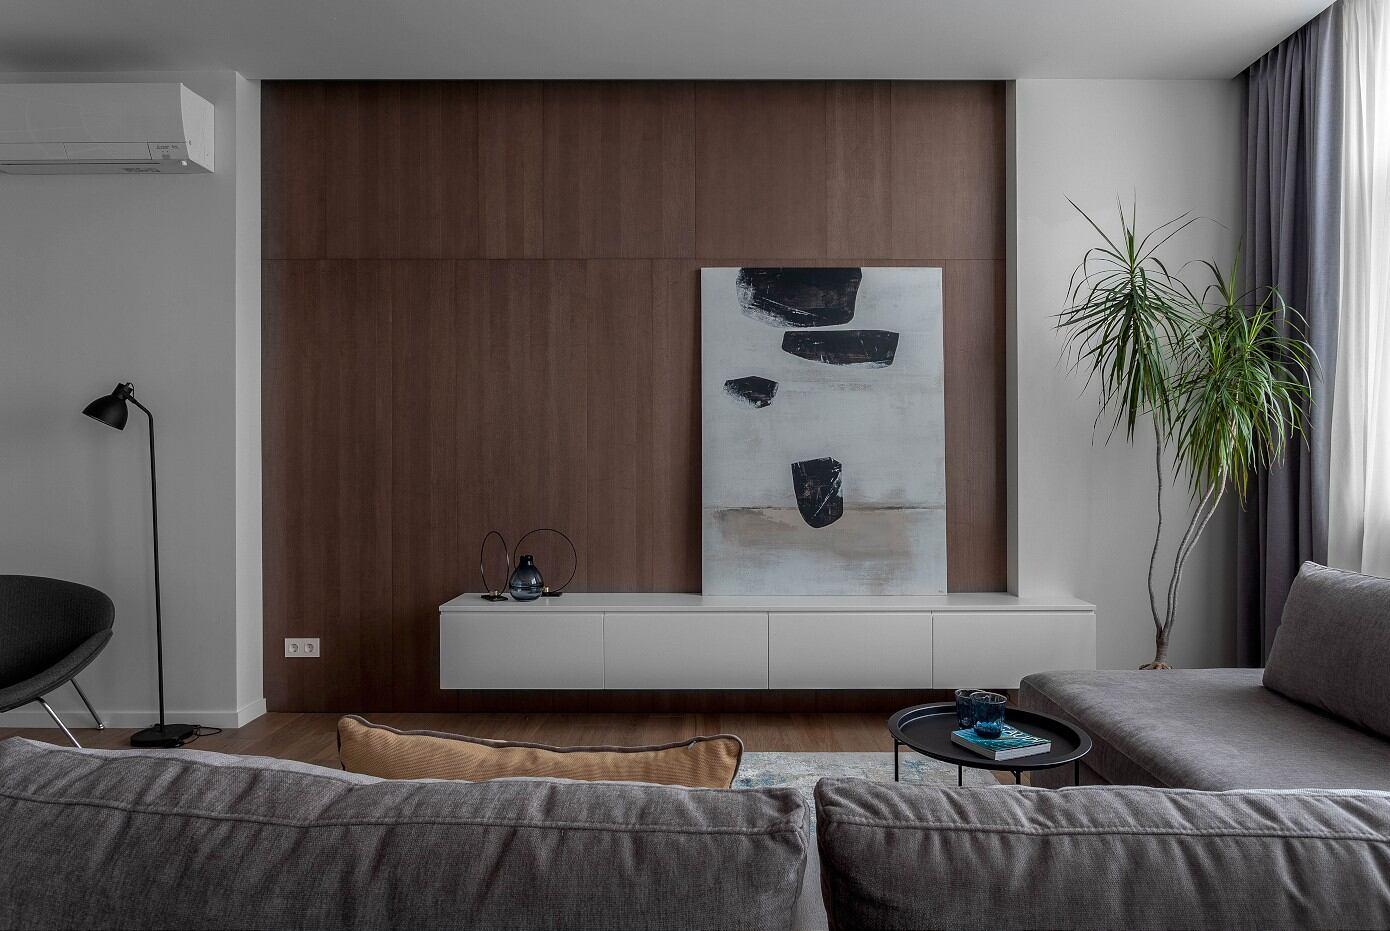 Modern Nest by Anastasia Kulhava and Nik Gusev